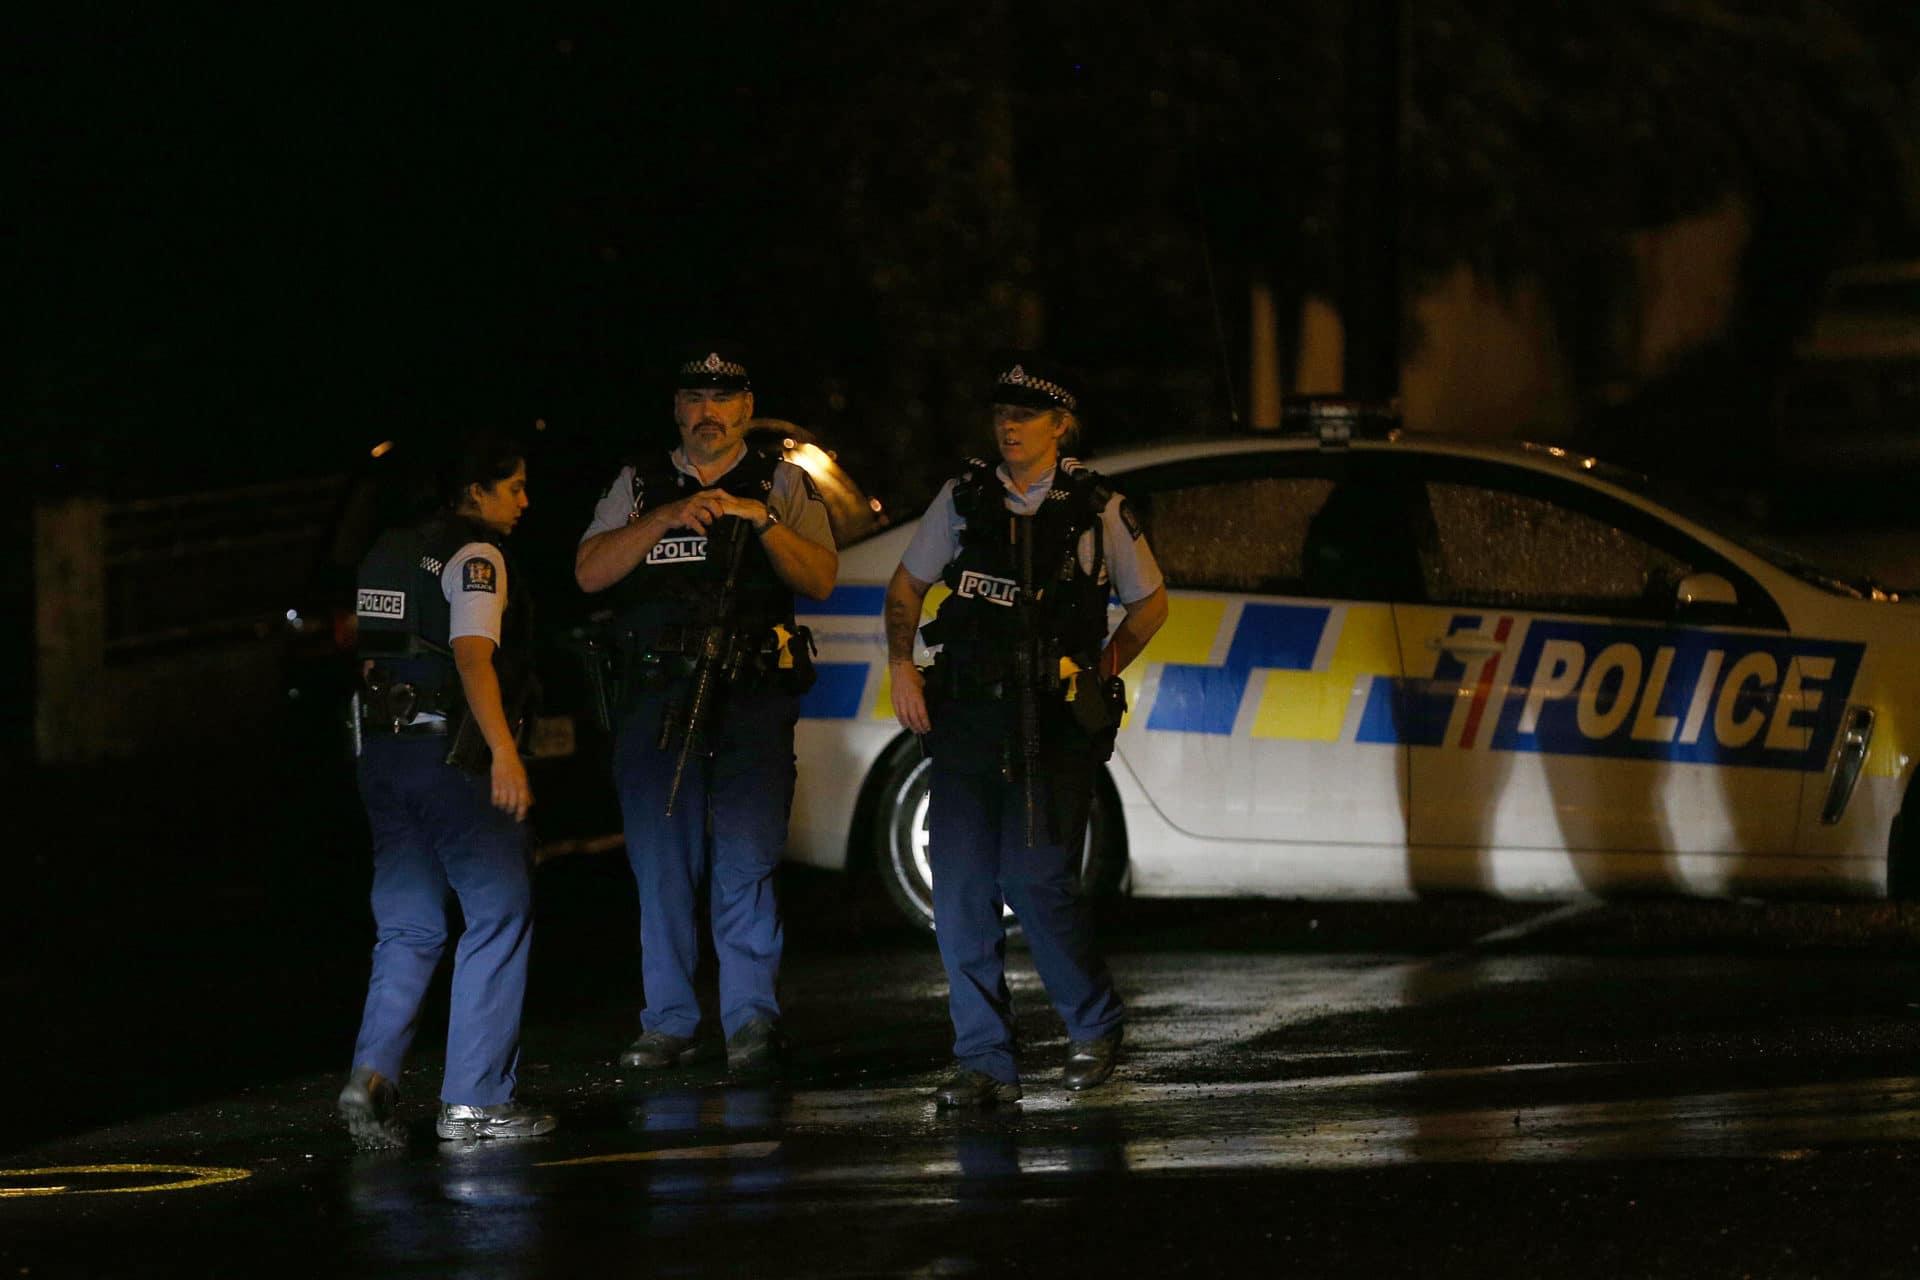 New Zealand Mosque Shooting Updates Imran Khan Blames: Flipboard: Australian Senator Blames 'Muslim Presence' For